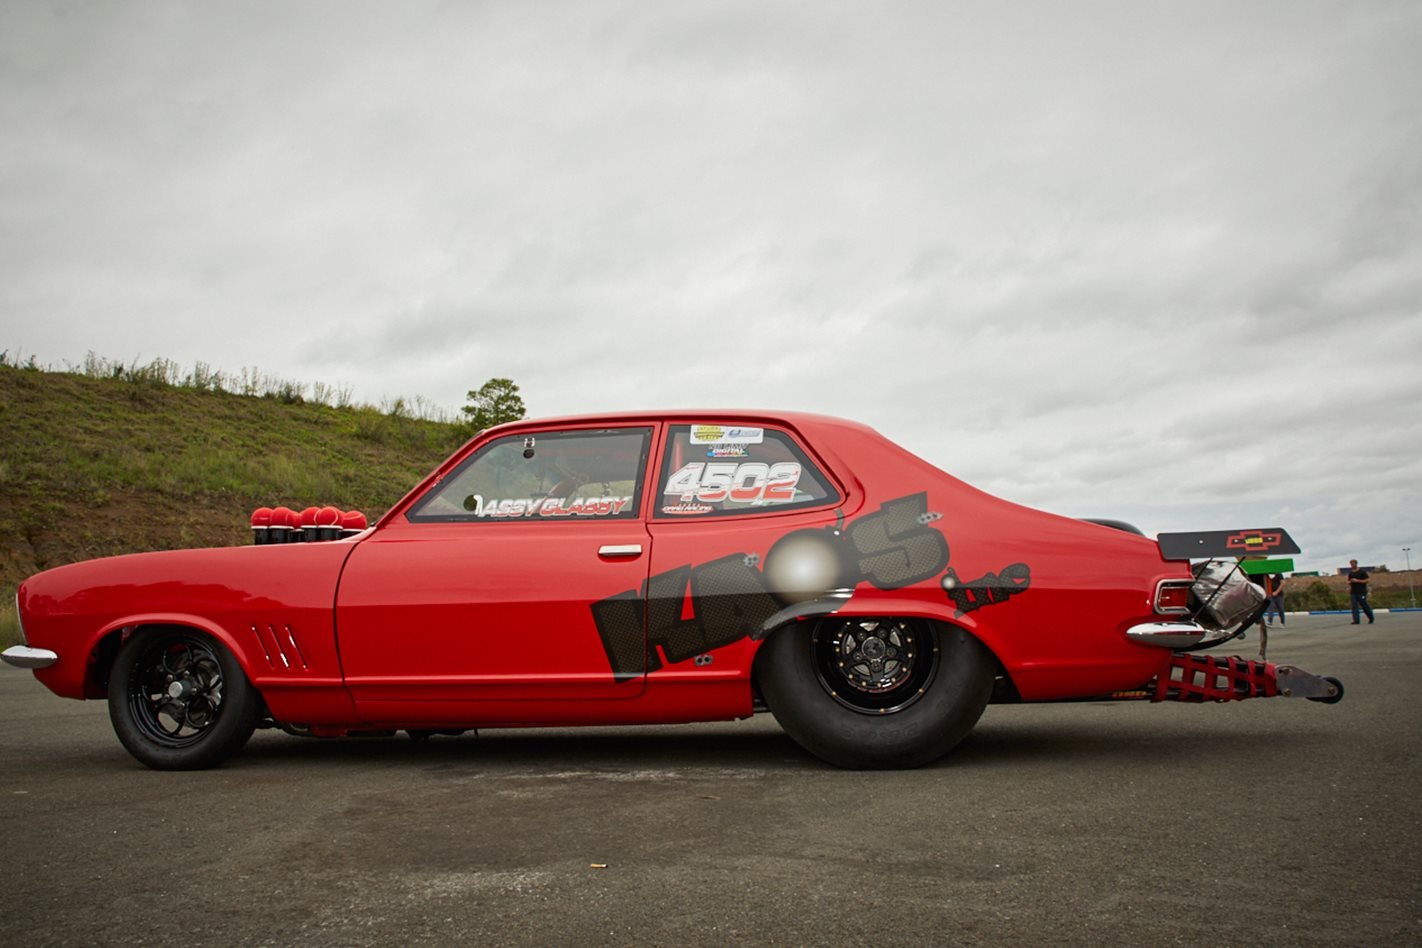 Holden LJ Torana drag car side